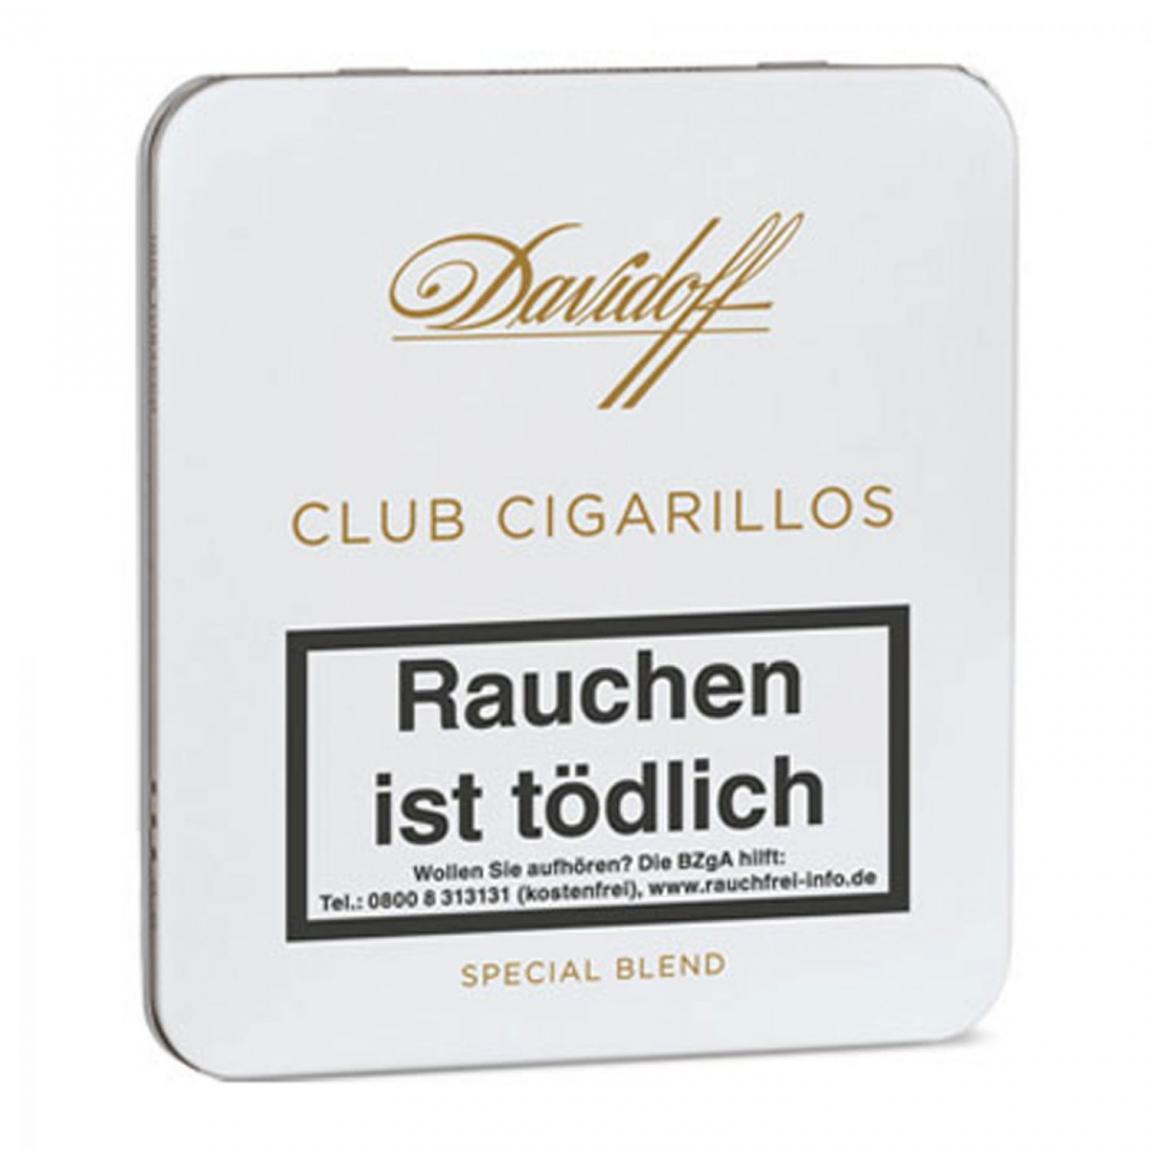 DAVIDOFF Club Cigarillos 10er Schachtel